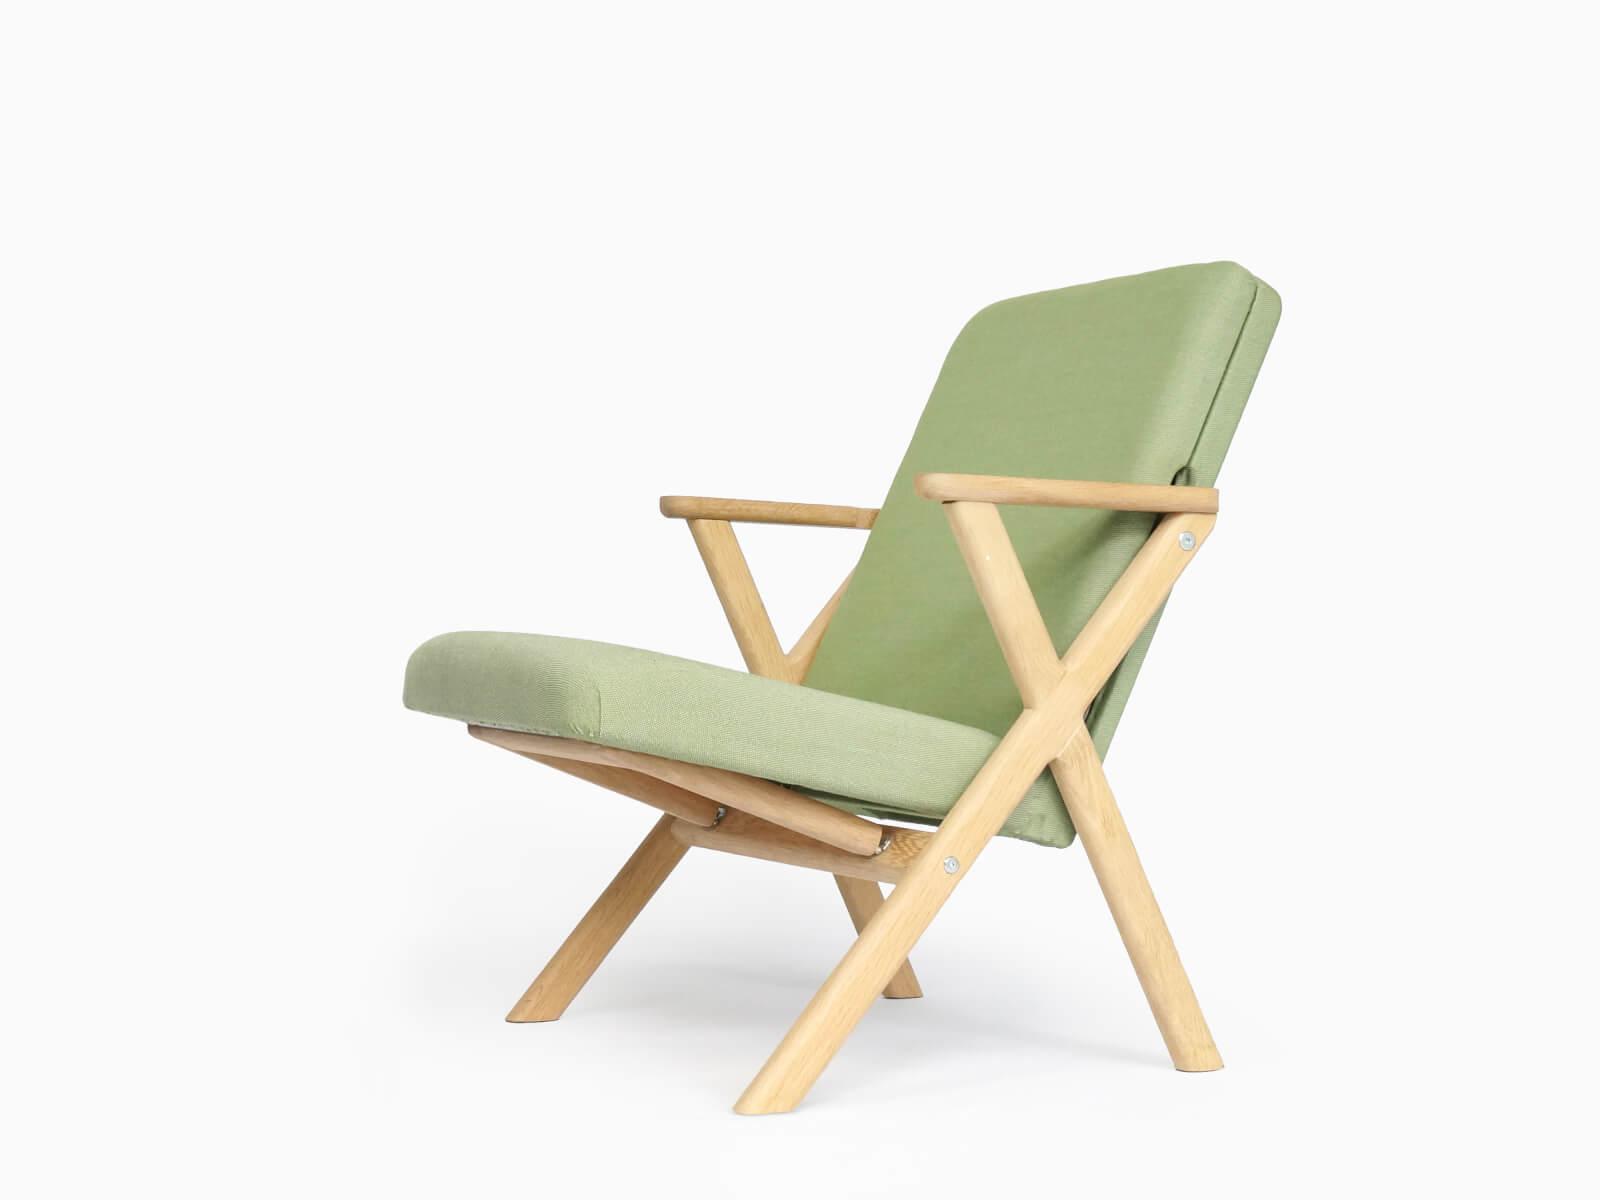 Surprising Hybrid Chair Alphanode Cool Chair Designs And Ideas Alphanodeonline